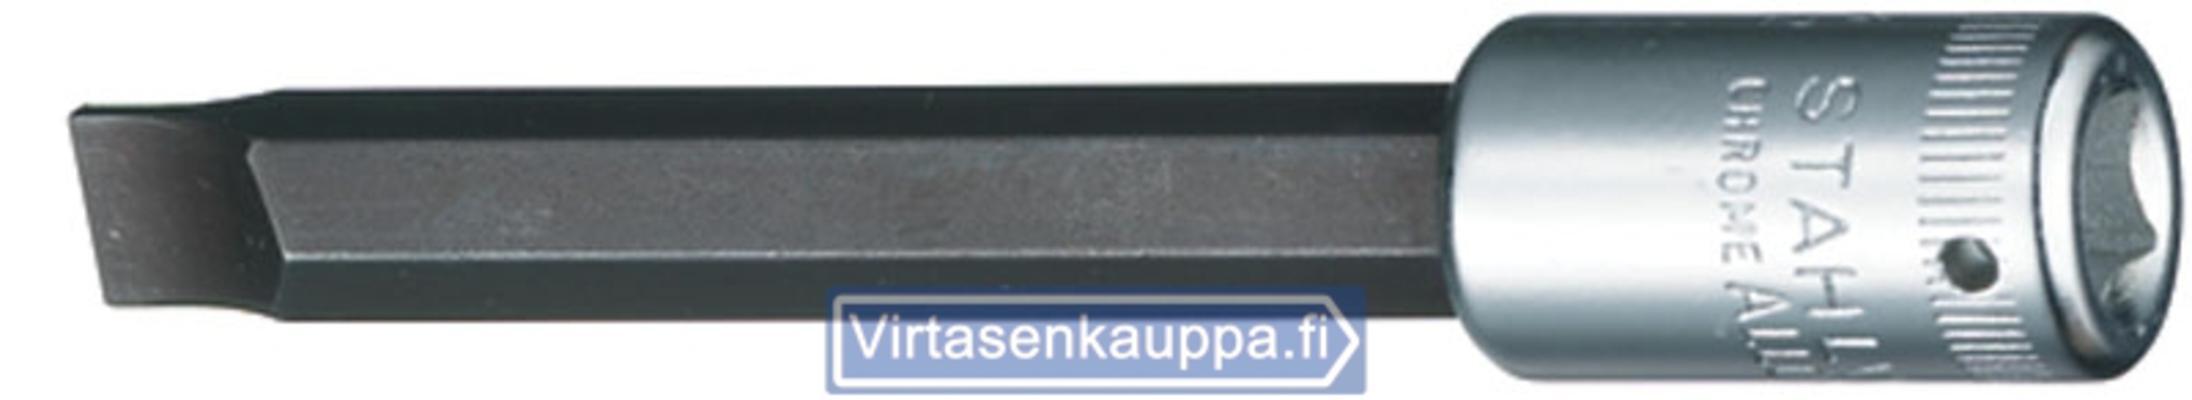 Ruuvitalttahylsy 0,5x3,0, Stahlwille - Ruuvitalttahylsy 0,5x3,0